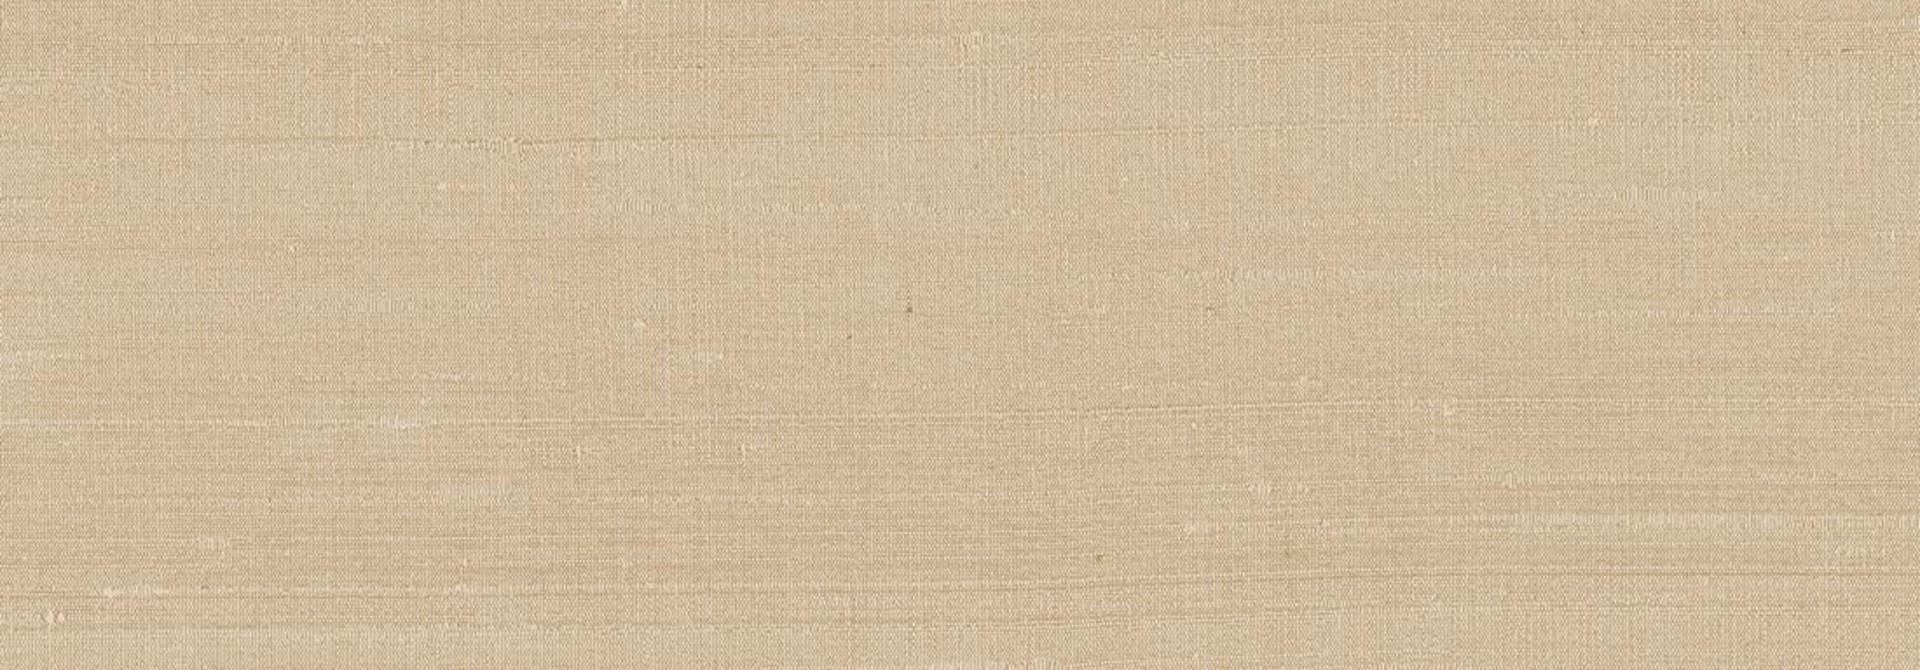 Behang 5089 Gember